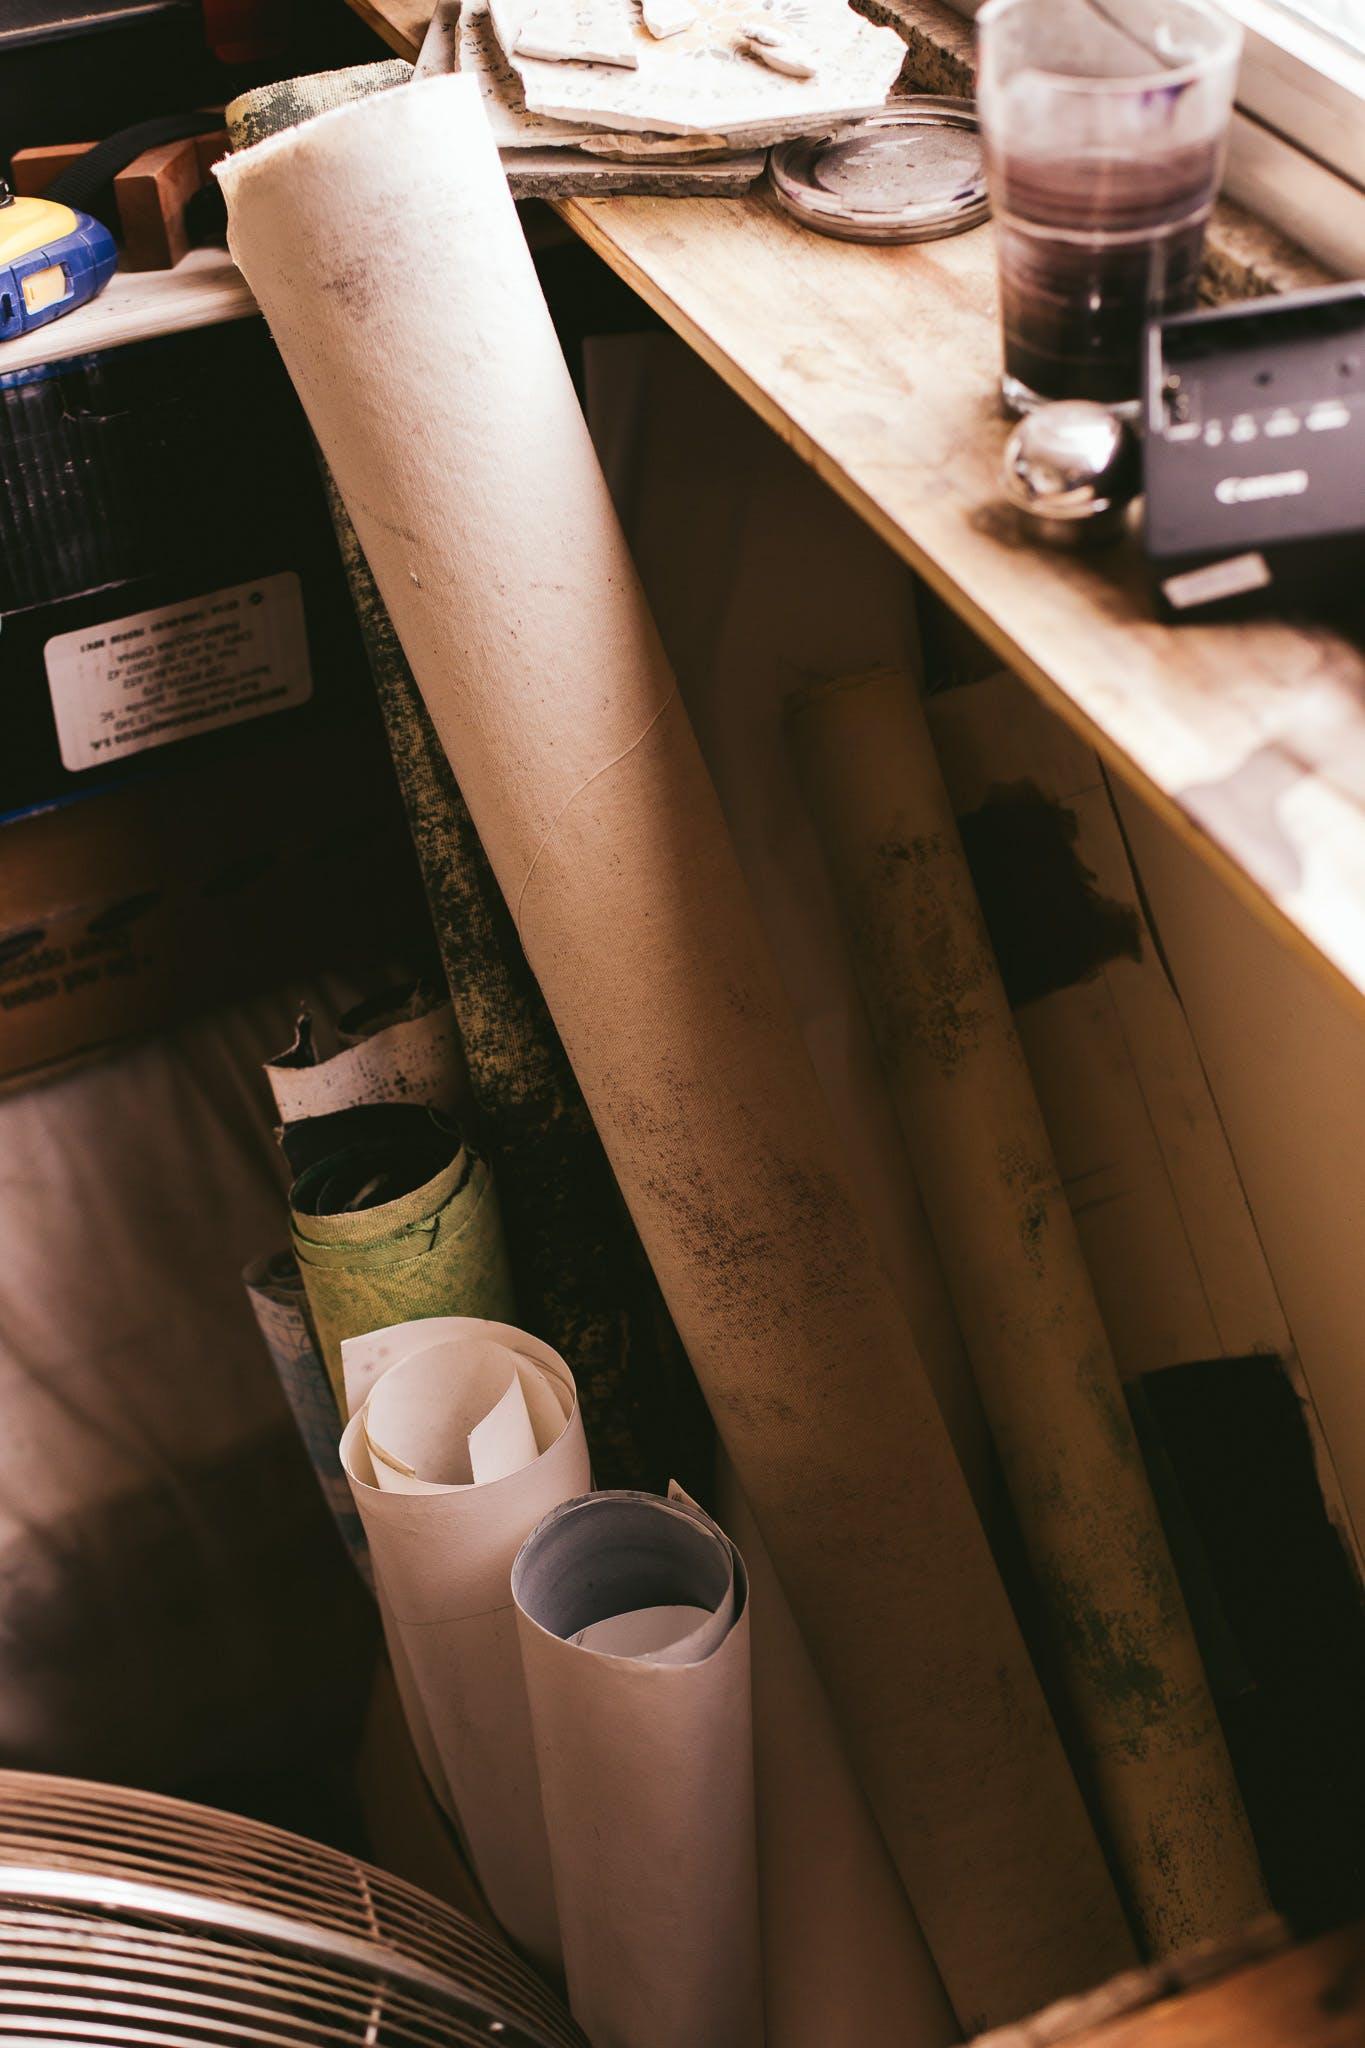 Assorted-color Paper Rolls Beside Wooden Shelf